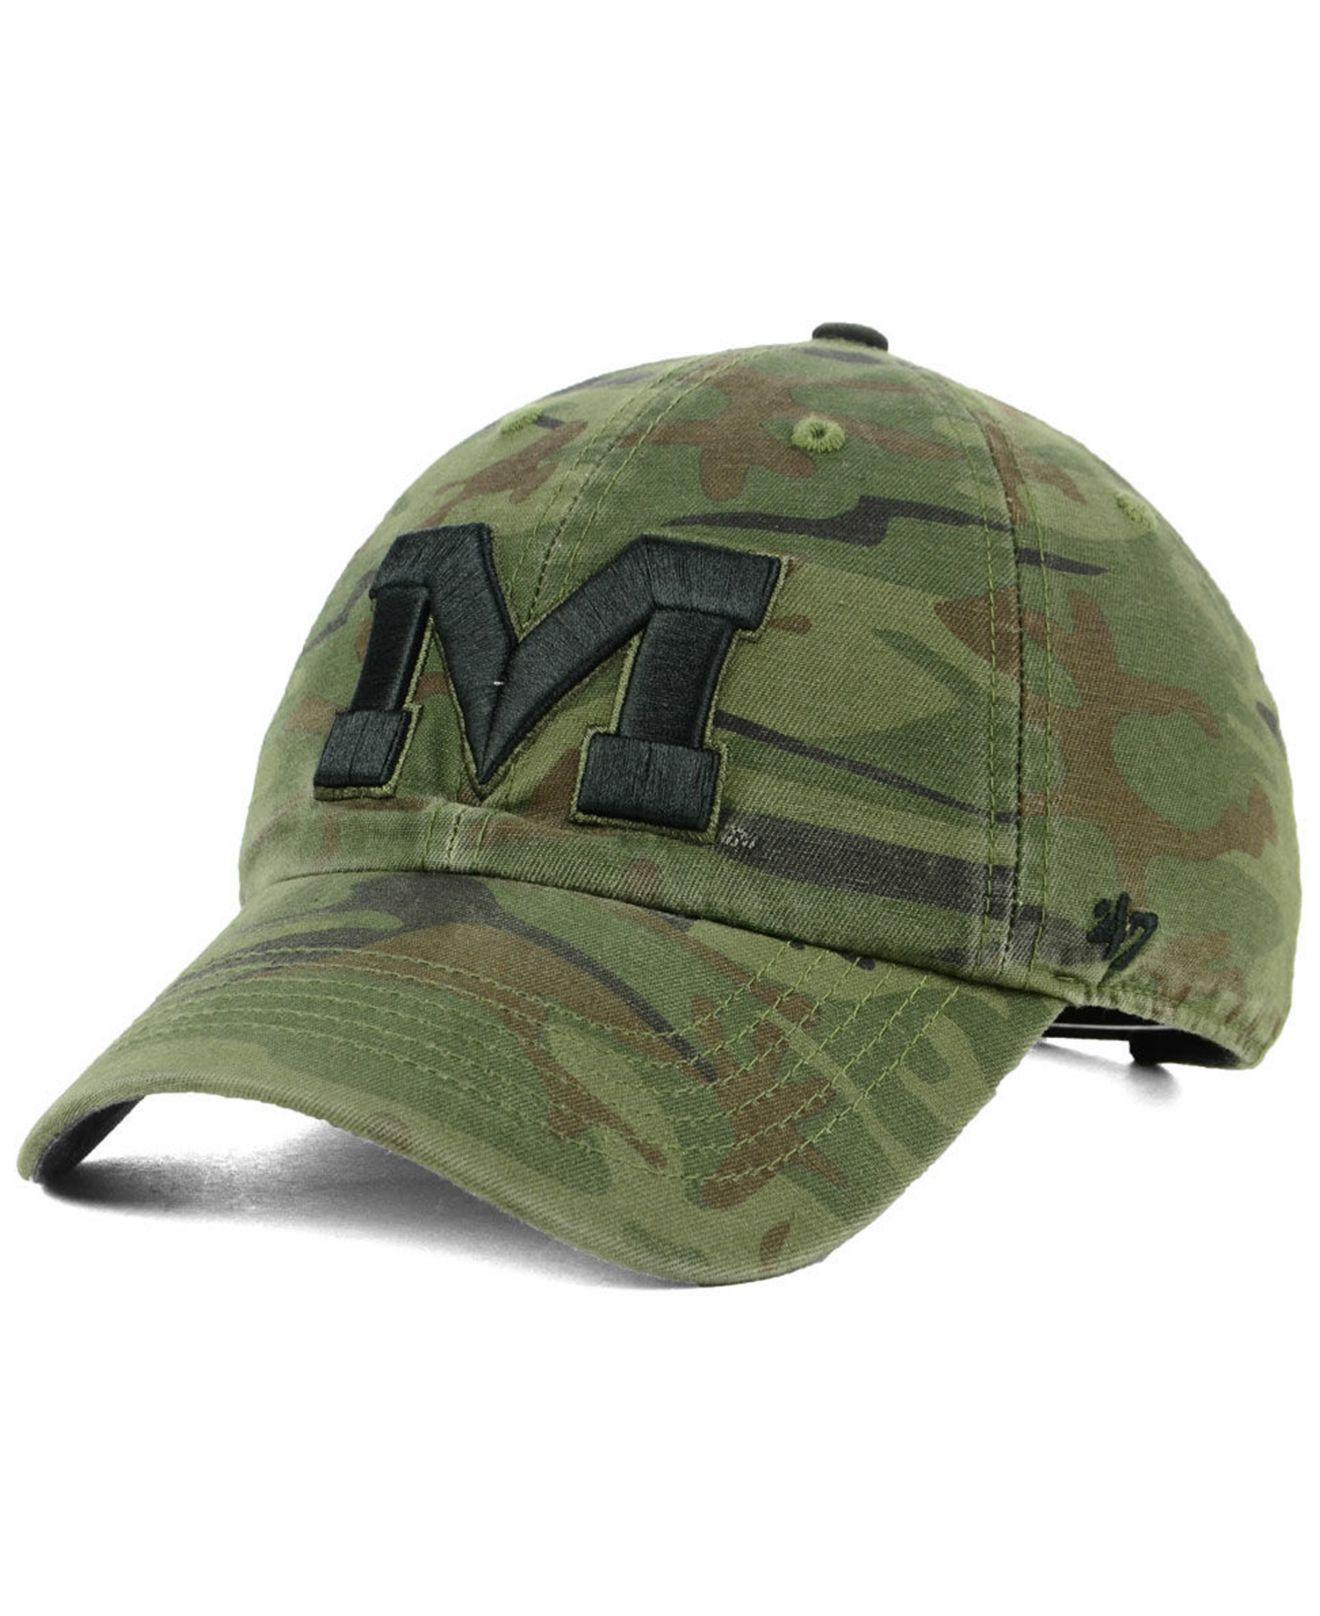 32e2d4a0194 Lyst - 47 Brand Ole Miss Rebels Regiment Clean Up Strapback Cap in ...